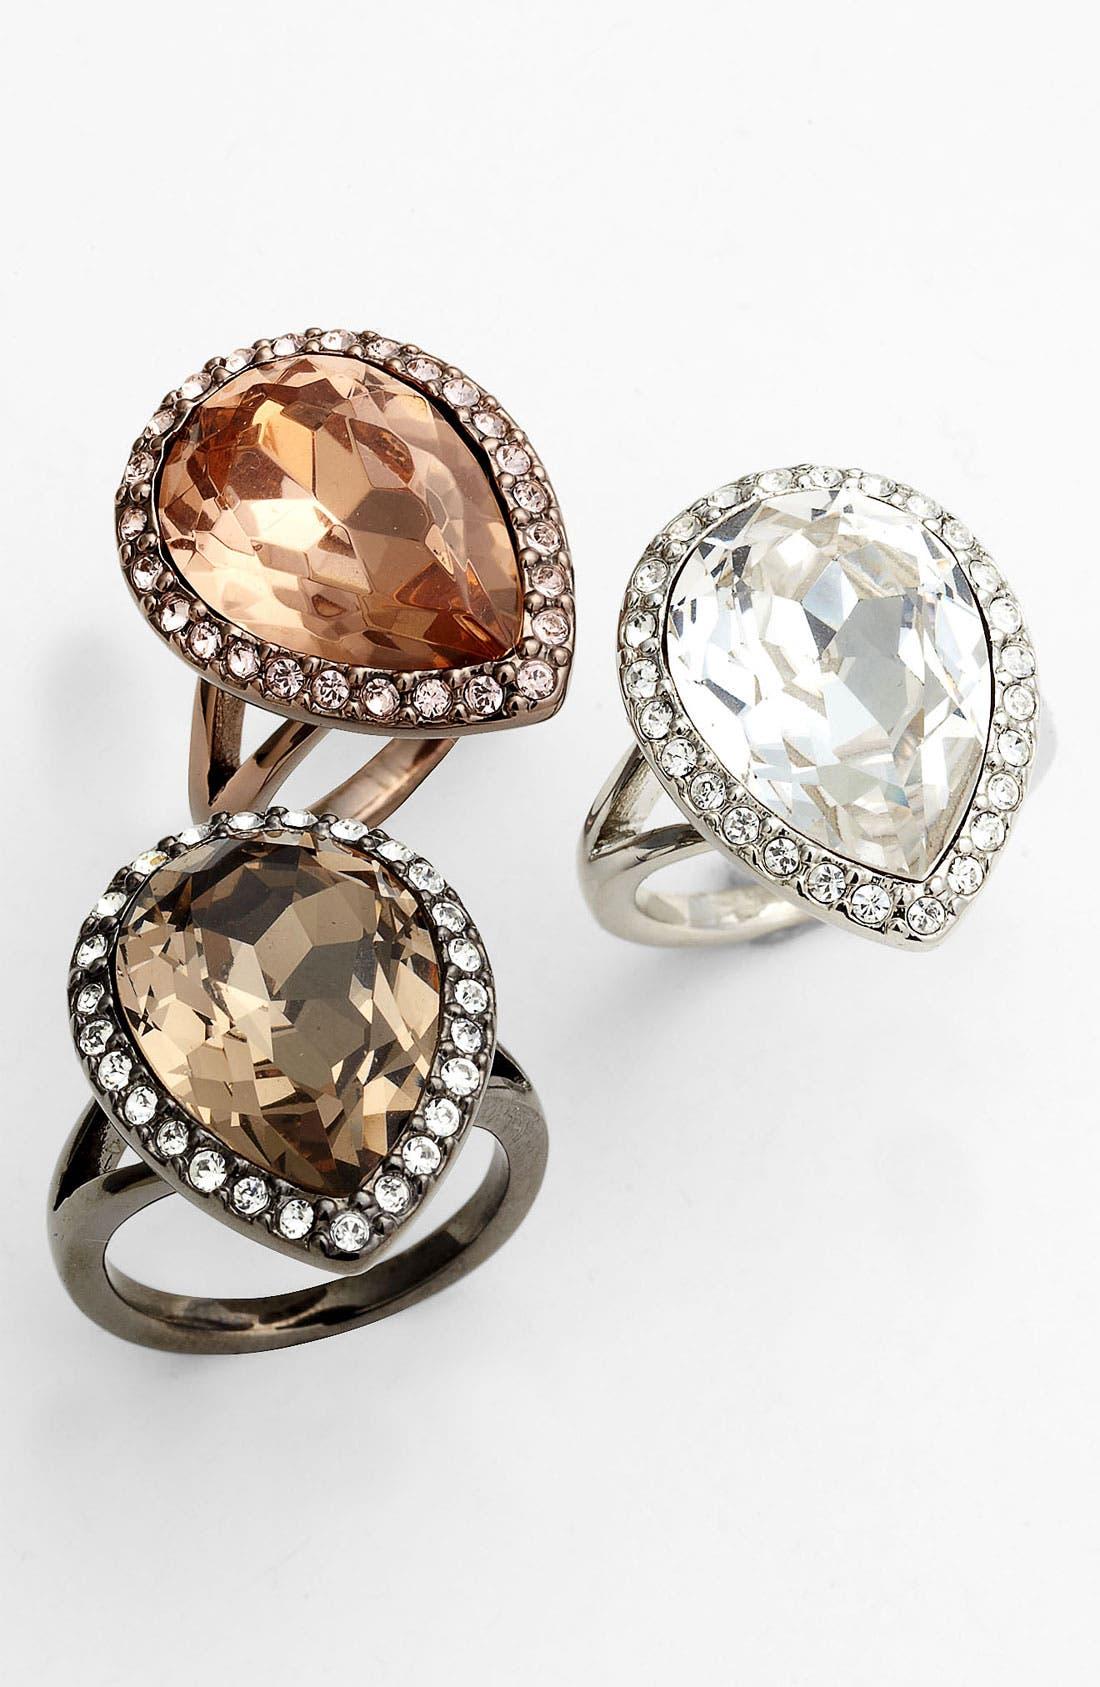 Main Image - Givenchy 'Rock Crystal' Cocktail Ring